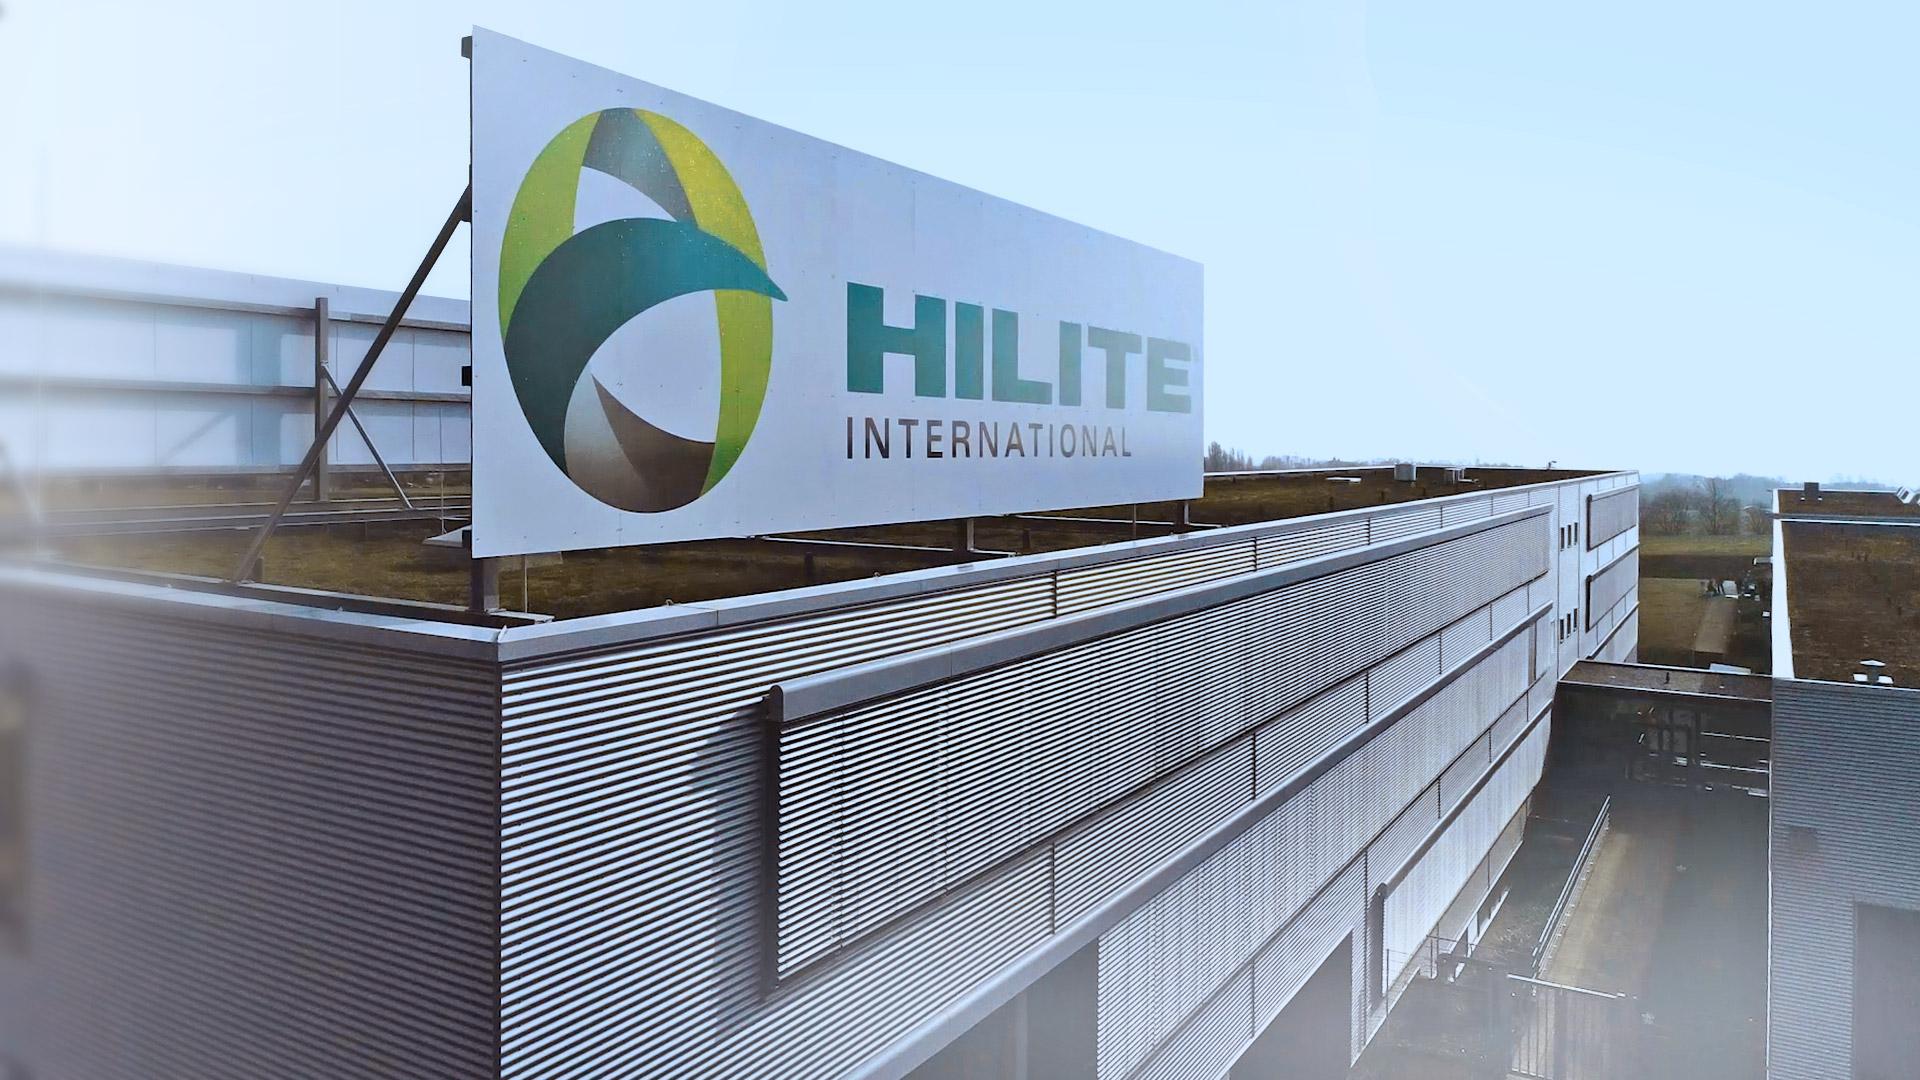 Locations - Hilite International (EN)